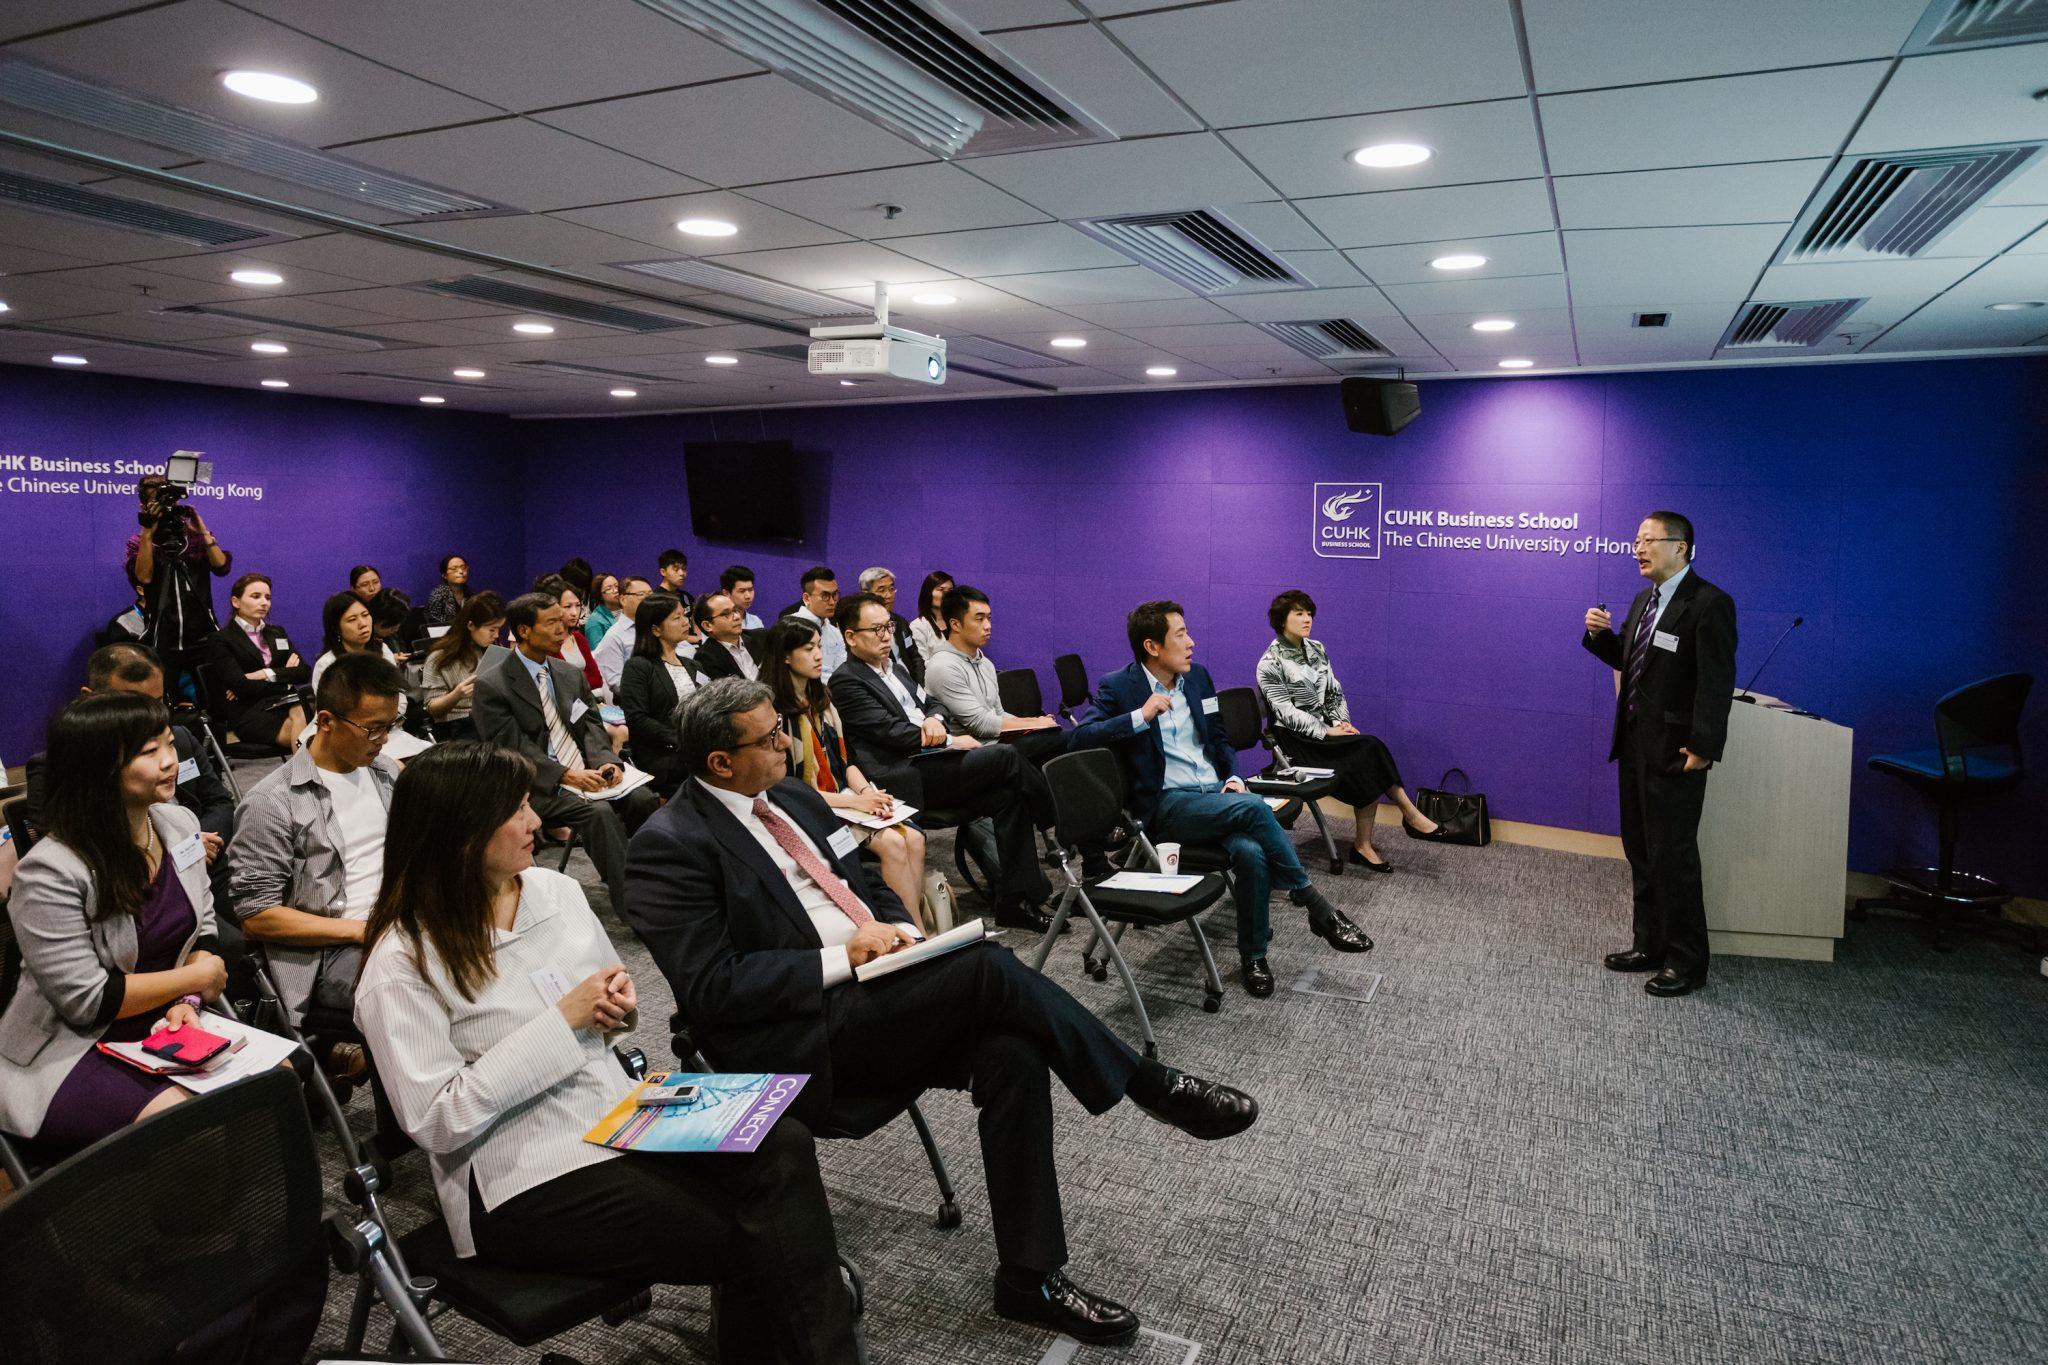 cuhk business school held - HD2048×1152